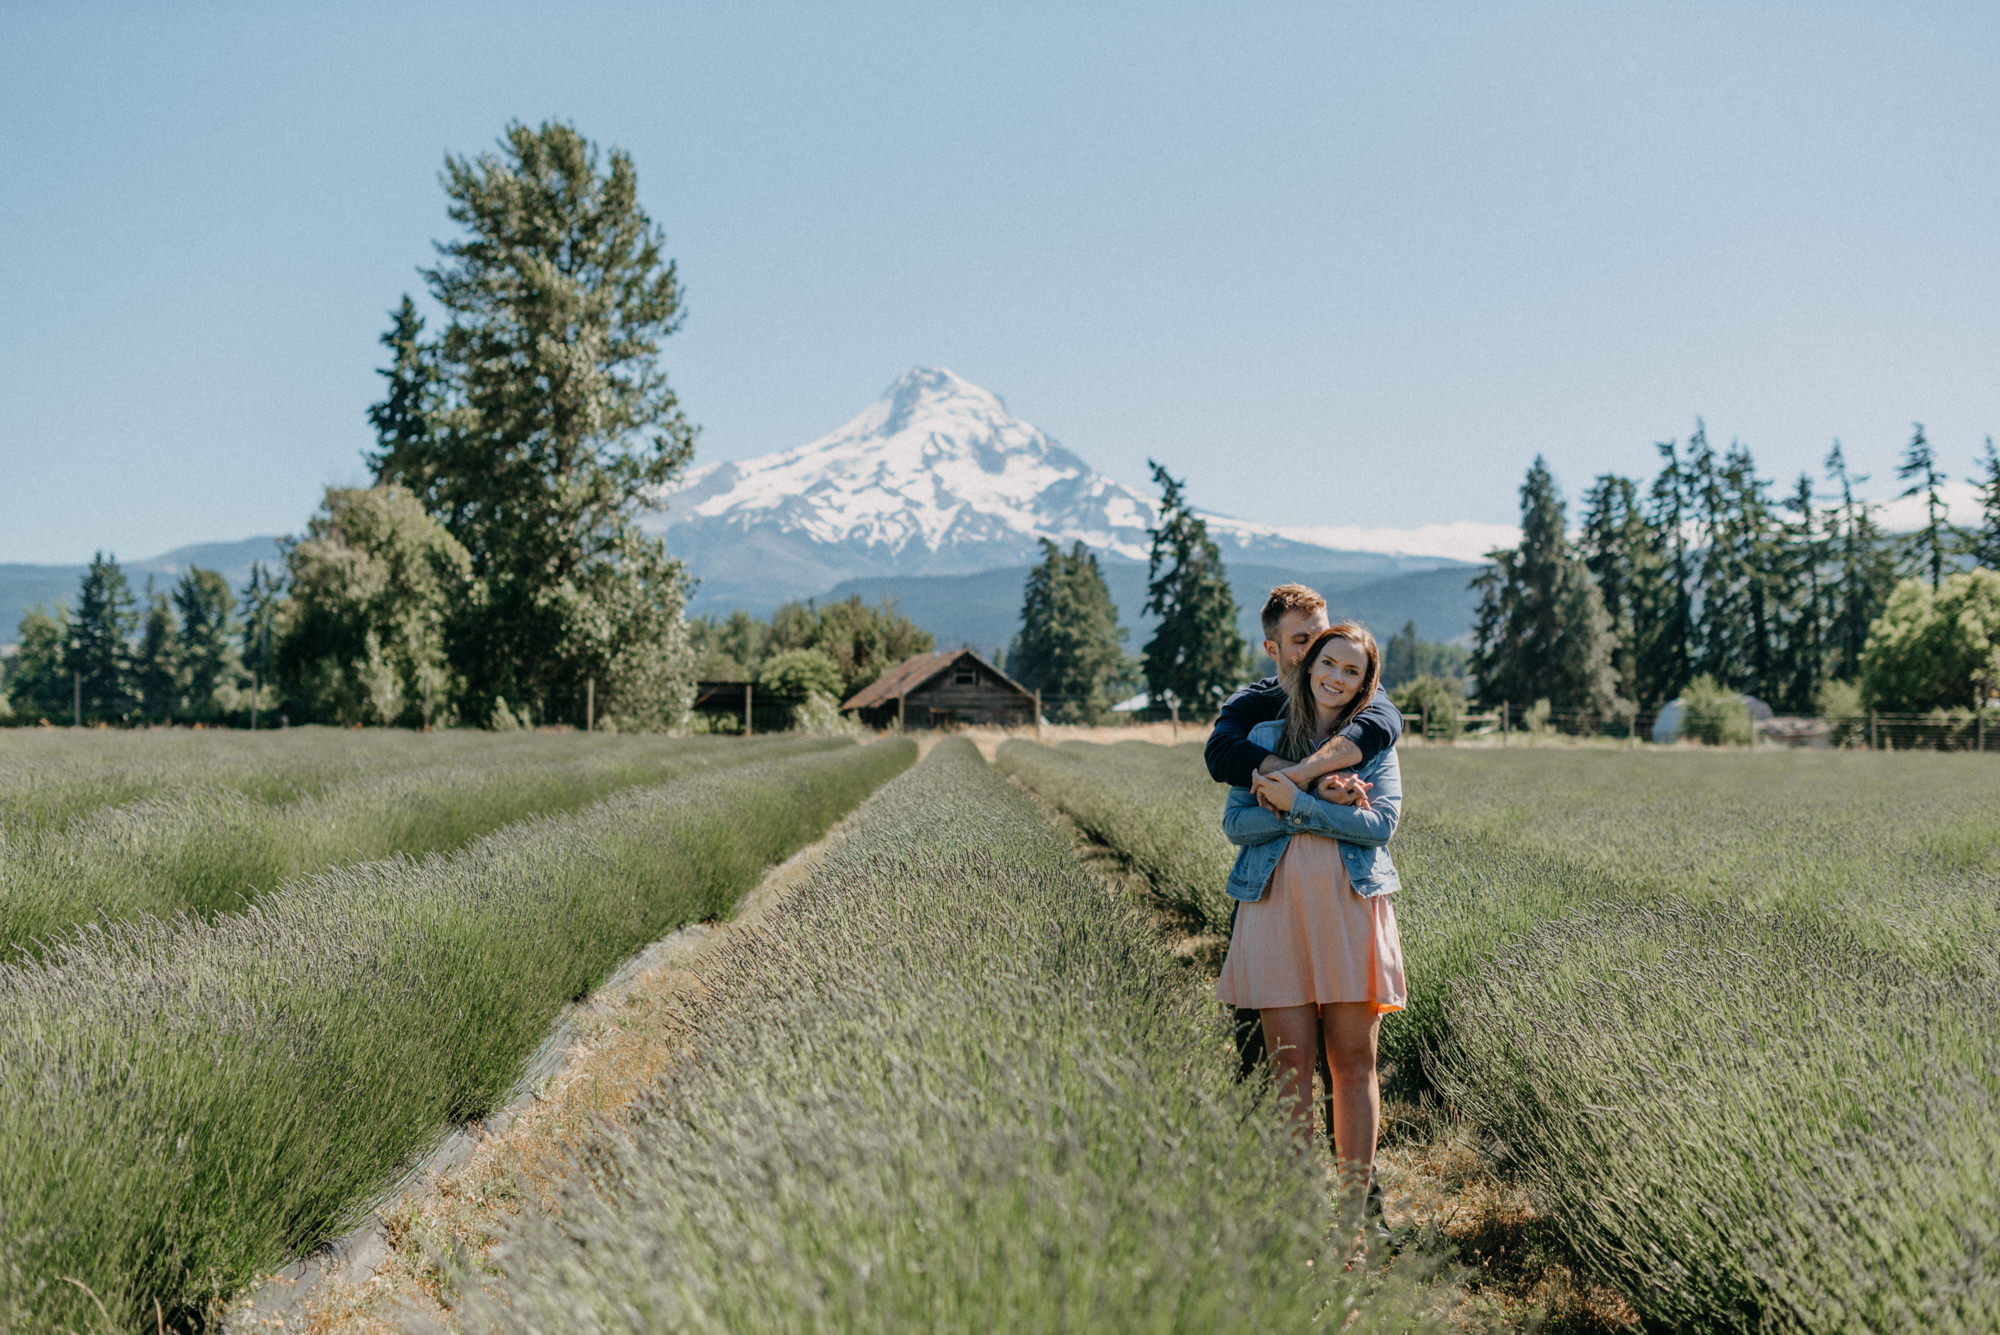 8-Mt-hood-lavender-farms-engagment-couple-summer-7106.jpg